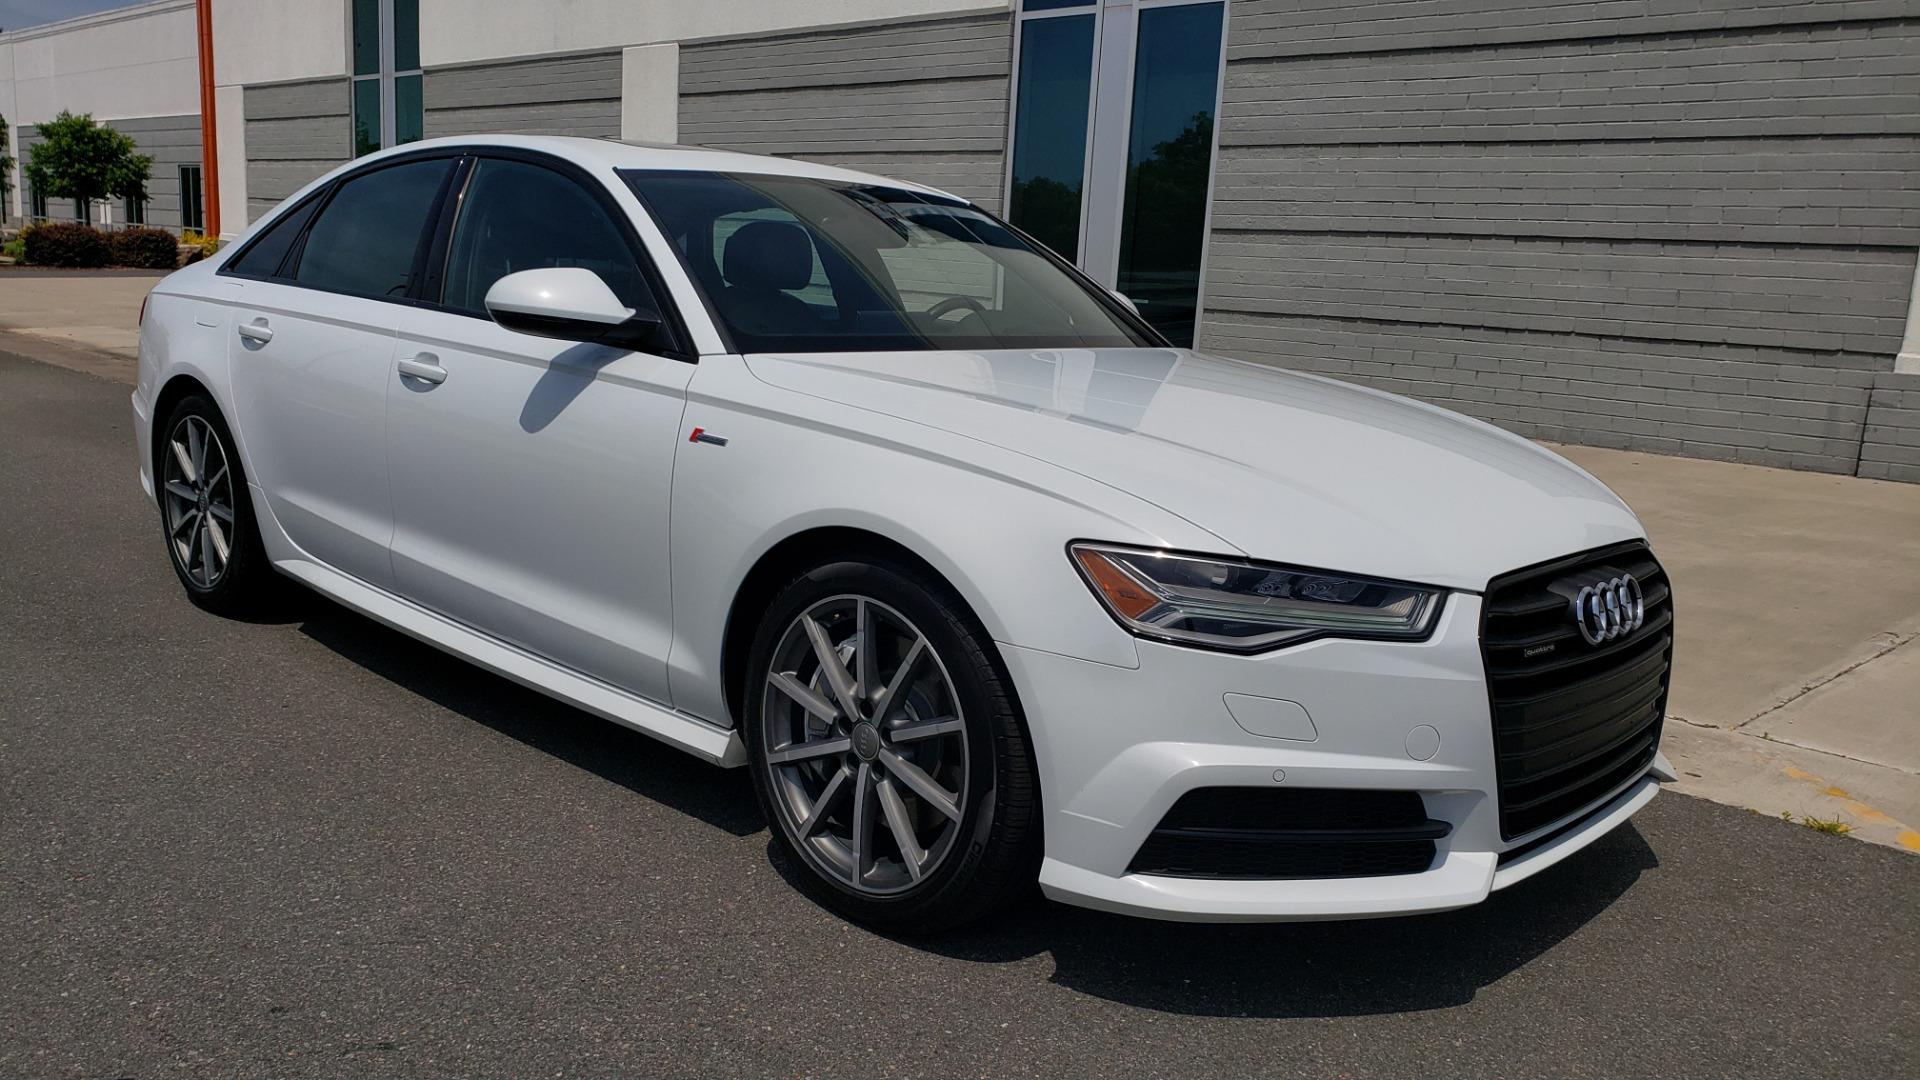 Used 2017 Audi A6 PRESTIGE SEDAN 3.0T / NAV / SUNROOF / BLACK OPTIC / CLD WTHR / REARVIEW for sale $30,797 at Formula Imports in Charlotte NC 28227 7